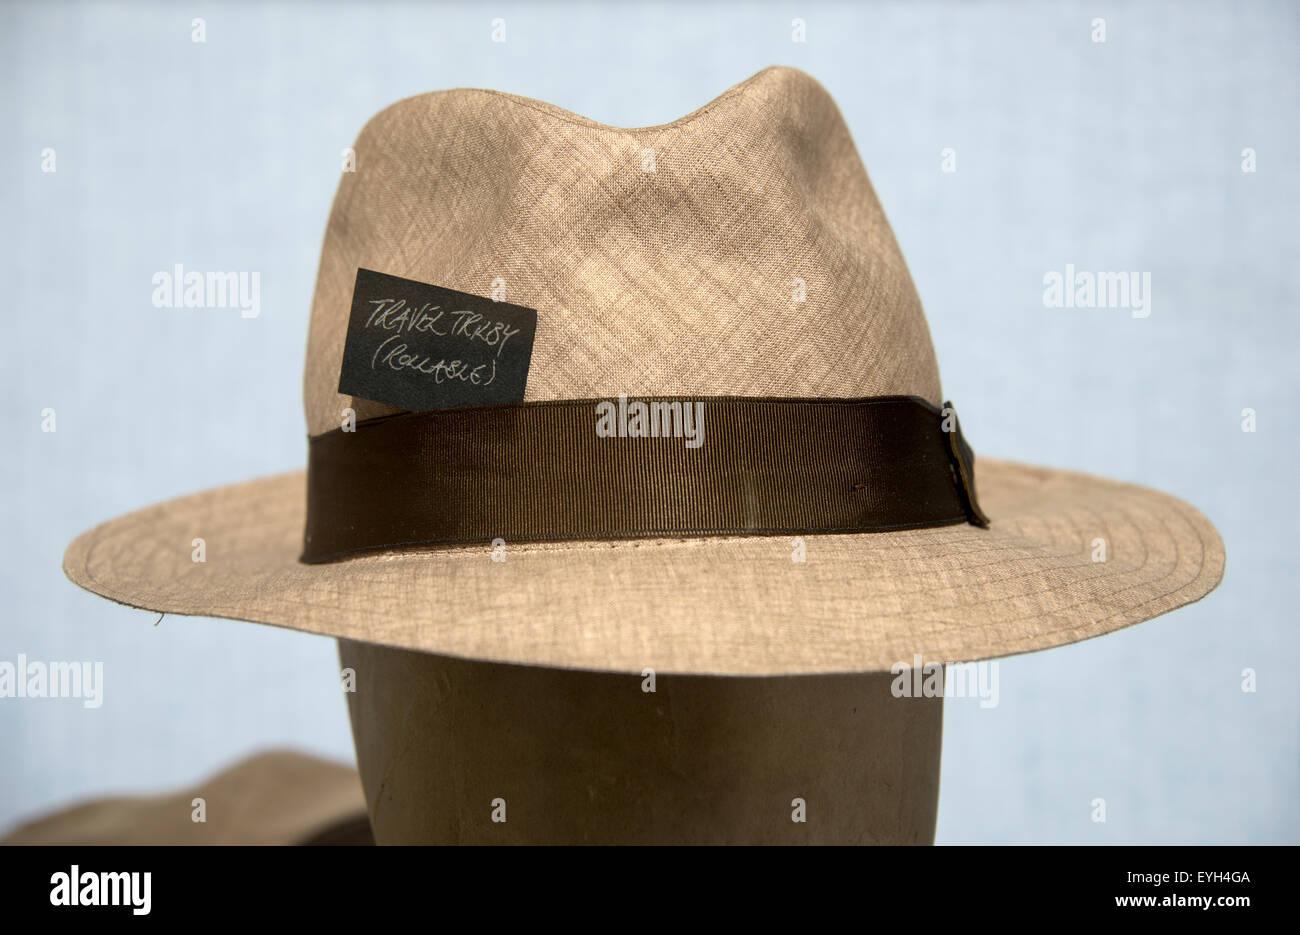 ba9a6cd59624c7 Travel Trilby hat on display Stock Photo: 85813962 - Alamy